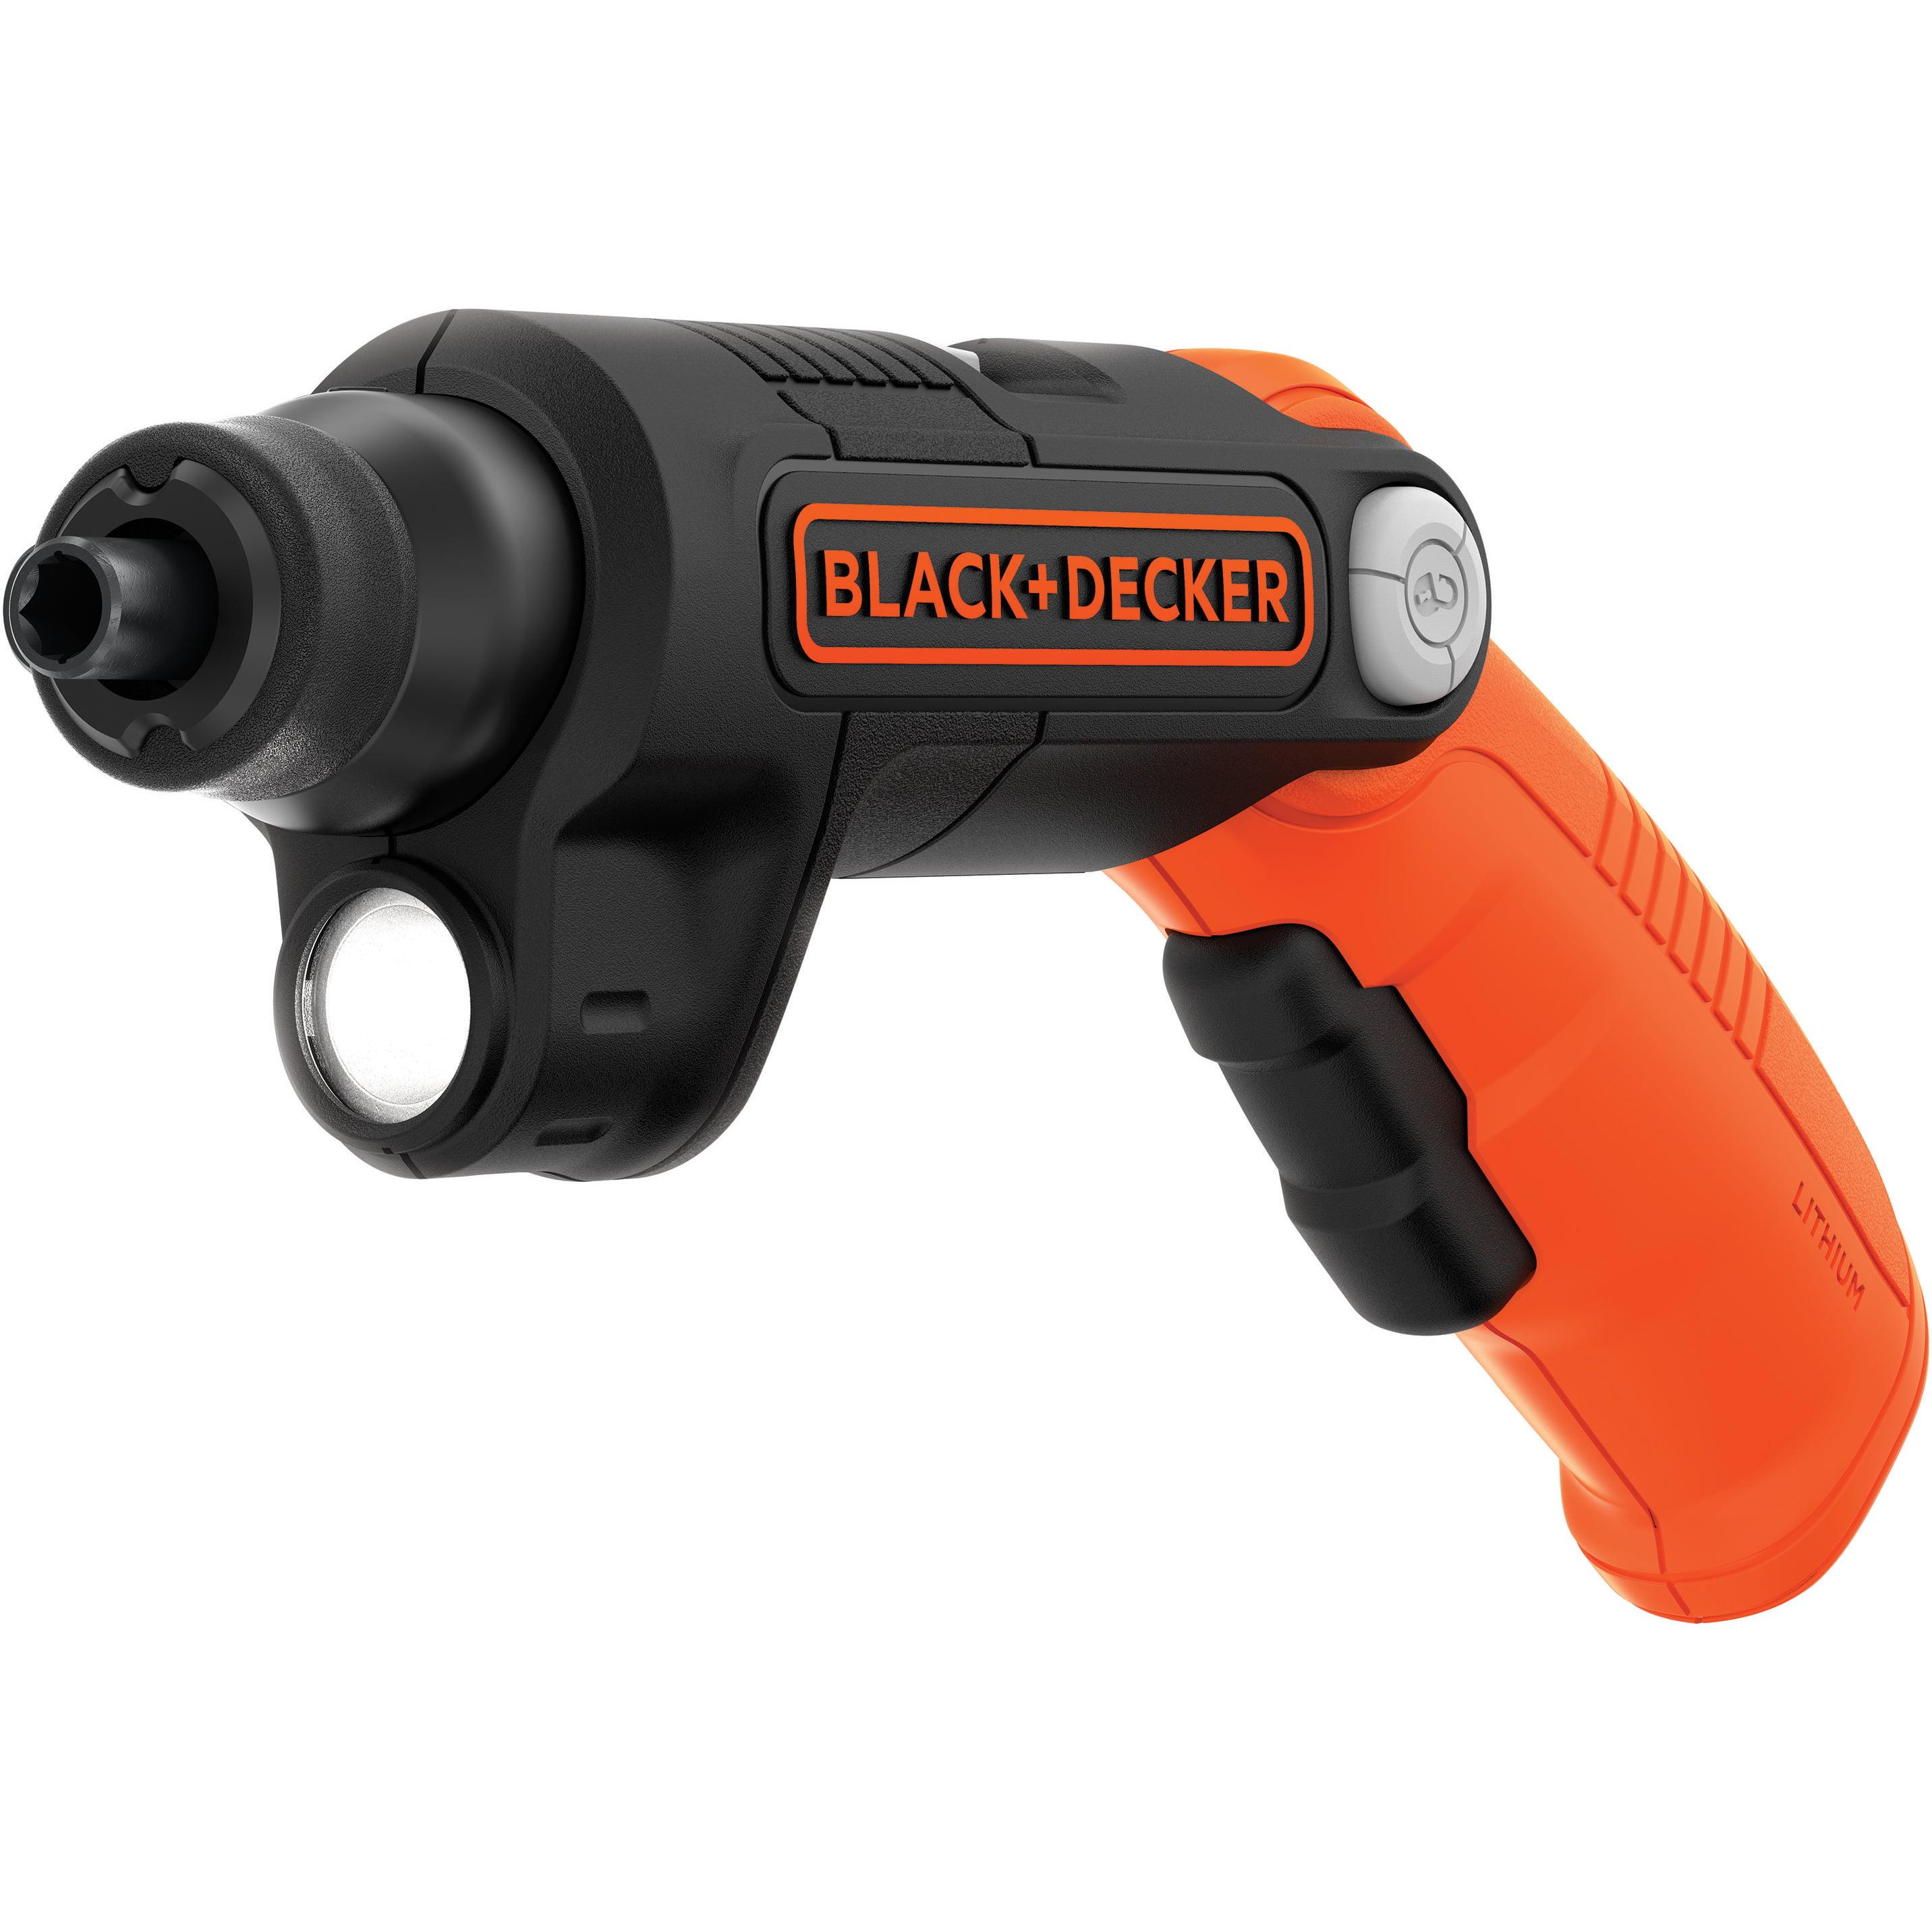 Black & Decker BDCSFL20C Pivot Light Screwdriver by Stanley Black & Decker